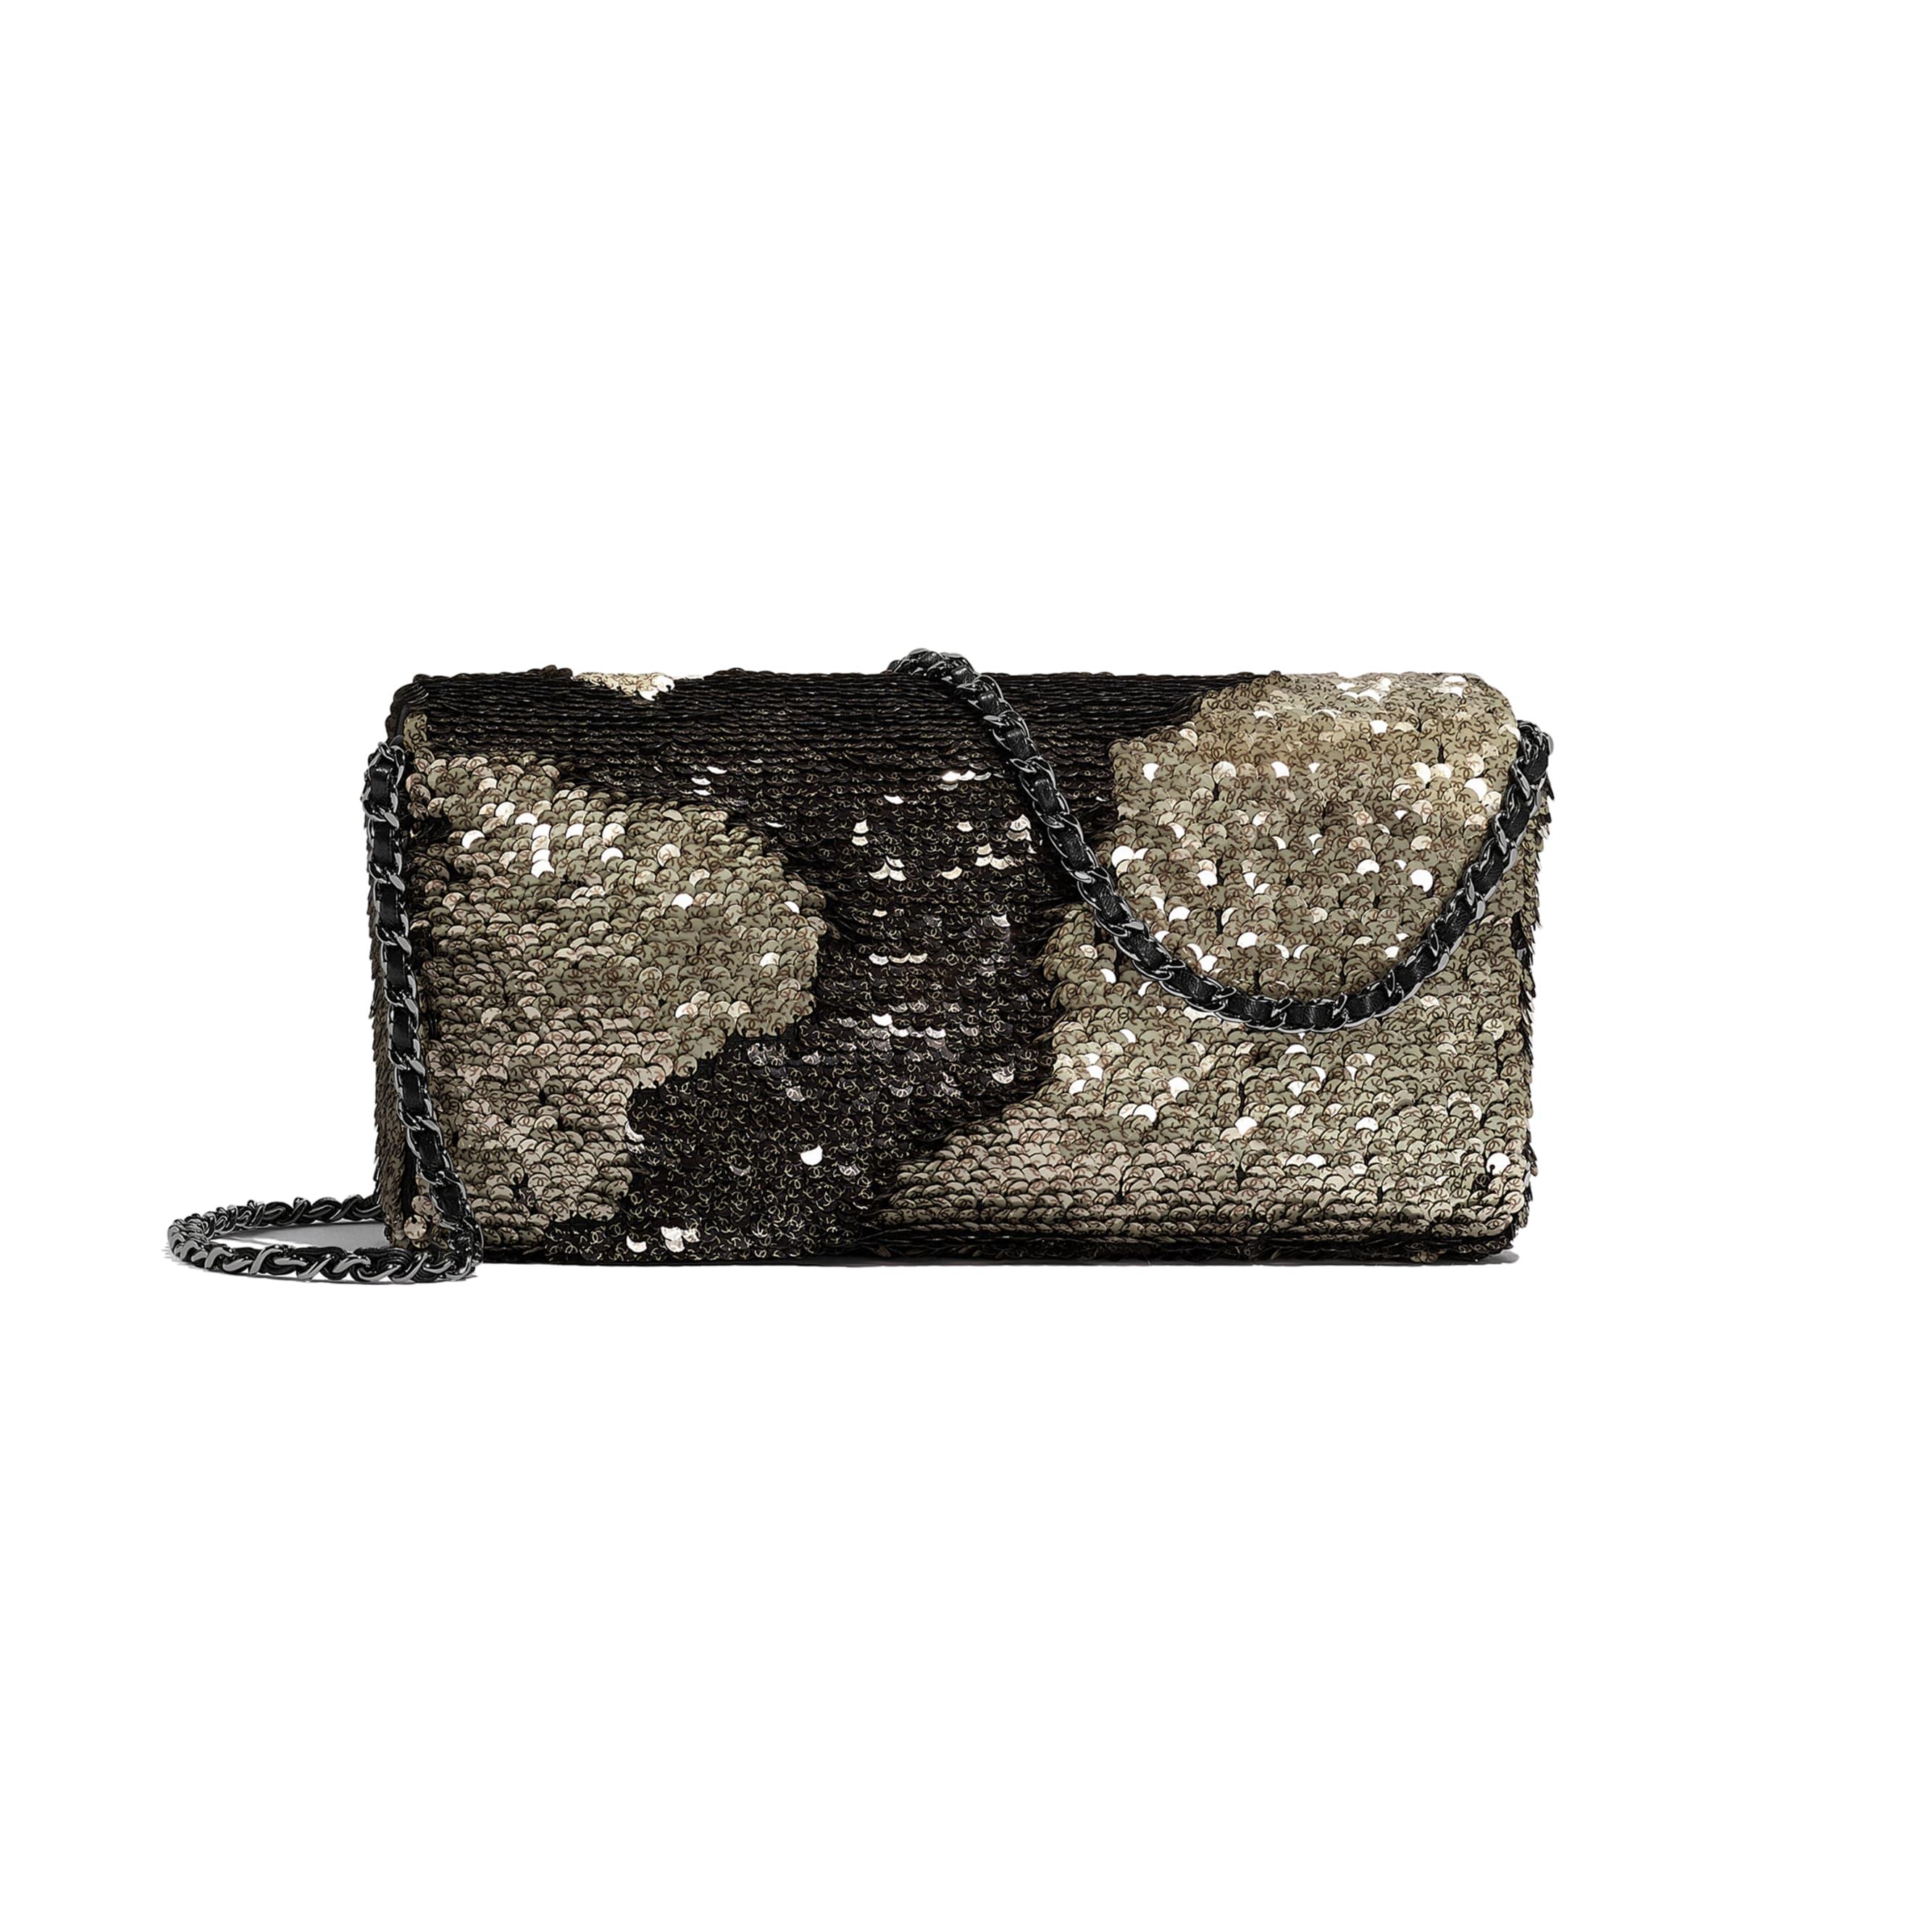 Flap Bag - Beige & Black - Sequins, Lambskin & Ruthenium-Finish Metal - CHANEL - Alternative view - see standard sized version